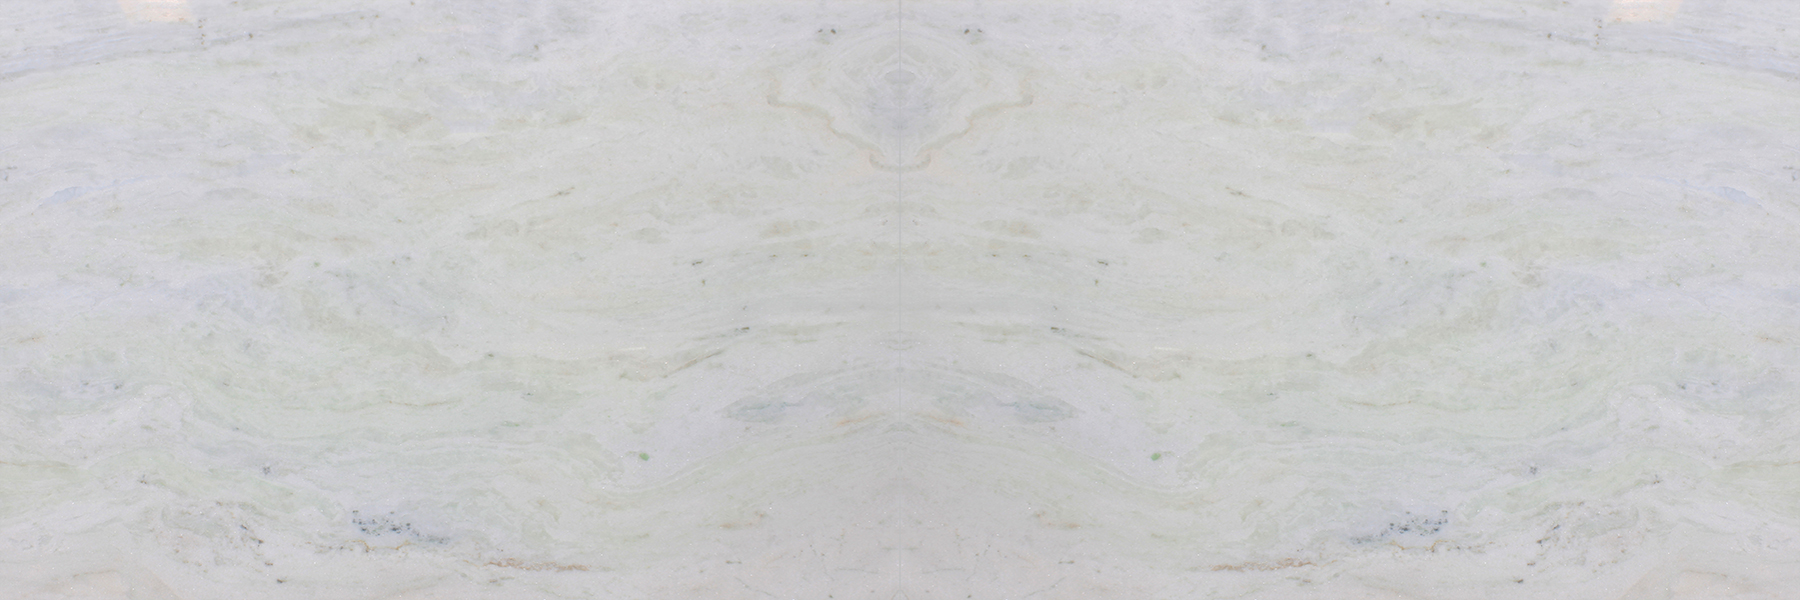 Marmo Light Onyx Horizontal Bookmatch A